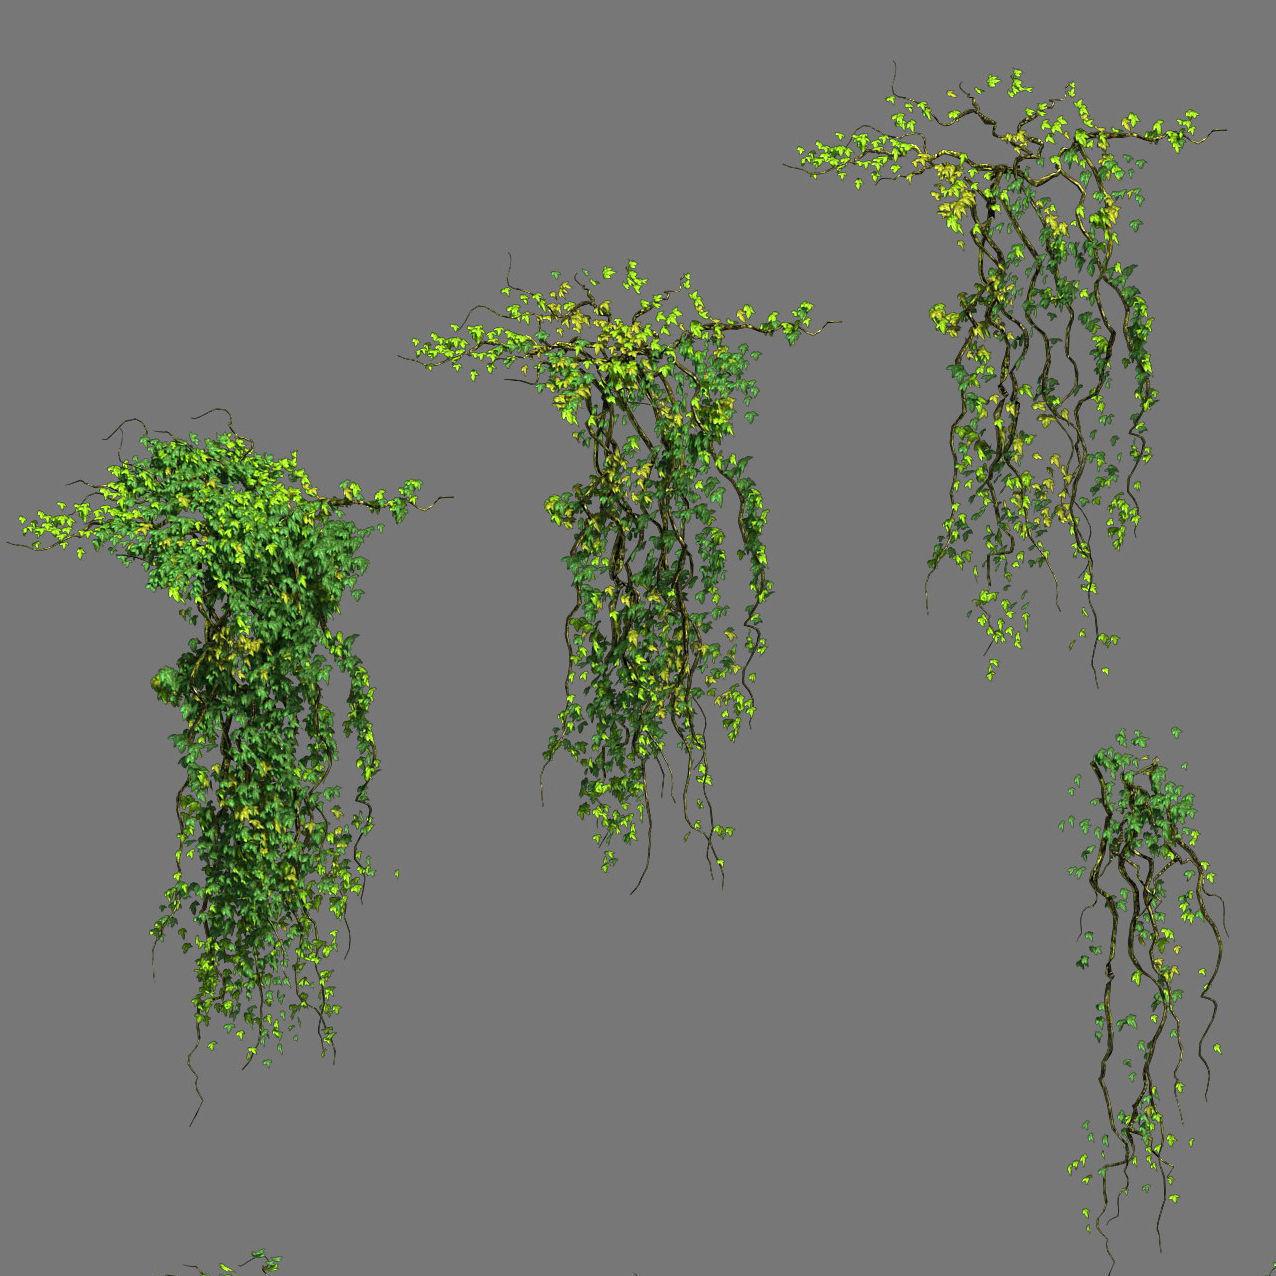 Decoration - vines